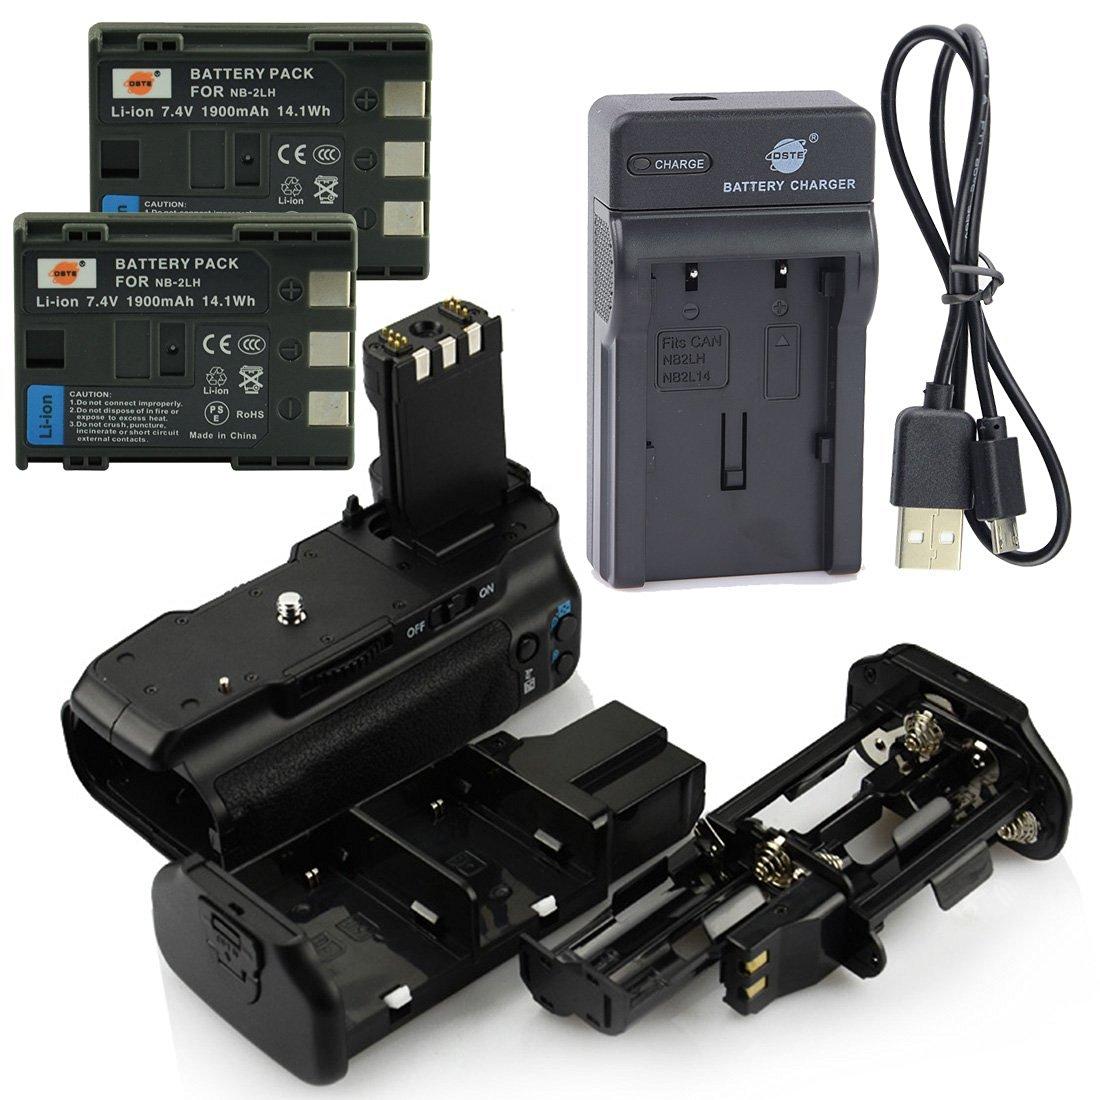 DSTE BG-E3 Battery Grip + 2x NB-2LH Battery + USB Charger for Canon EOS 350D 400D